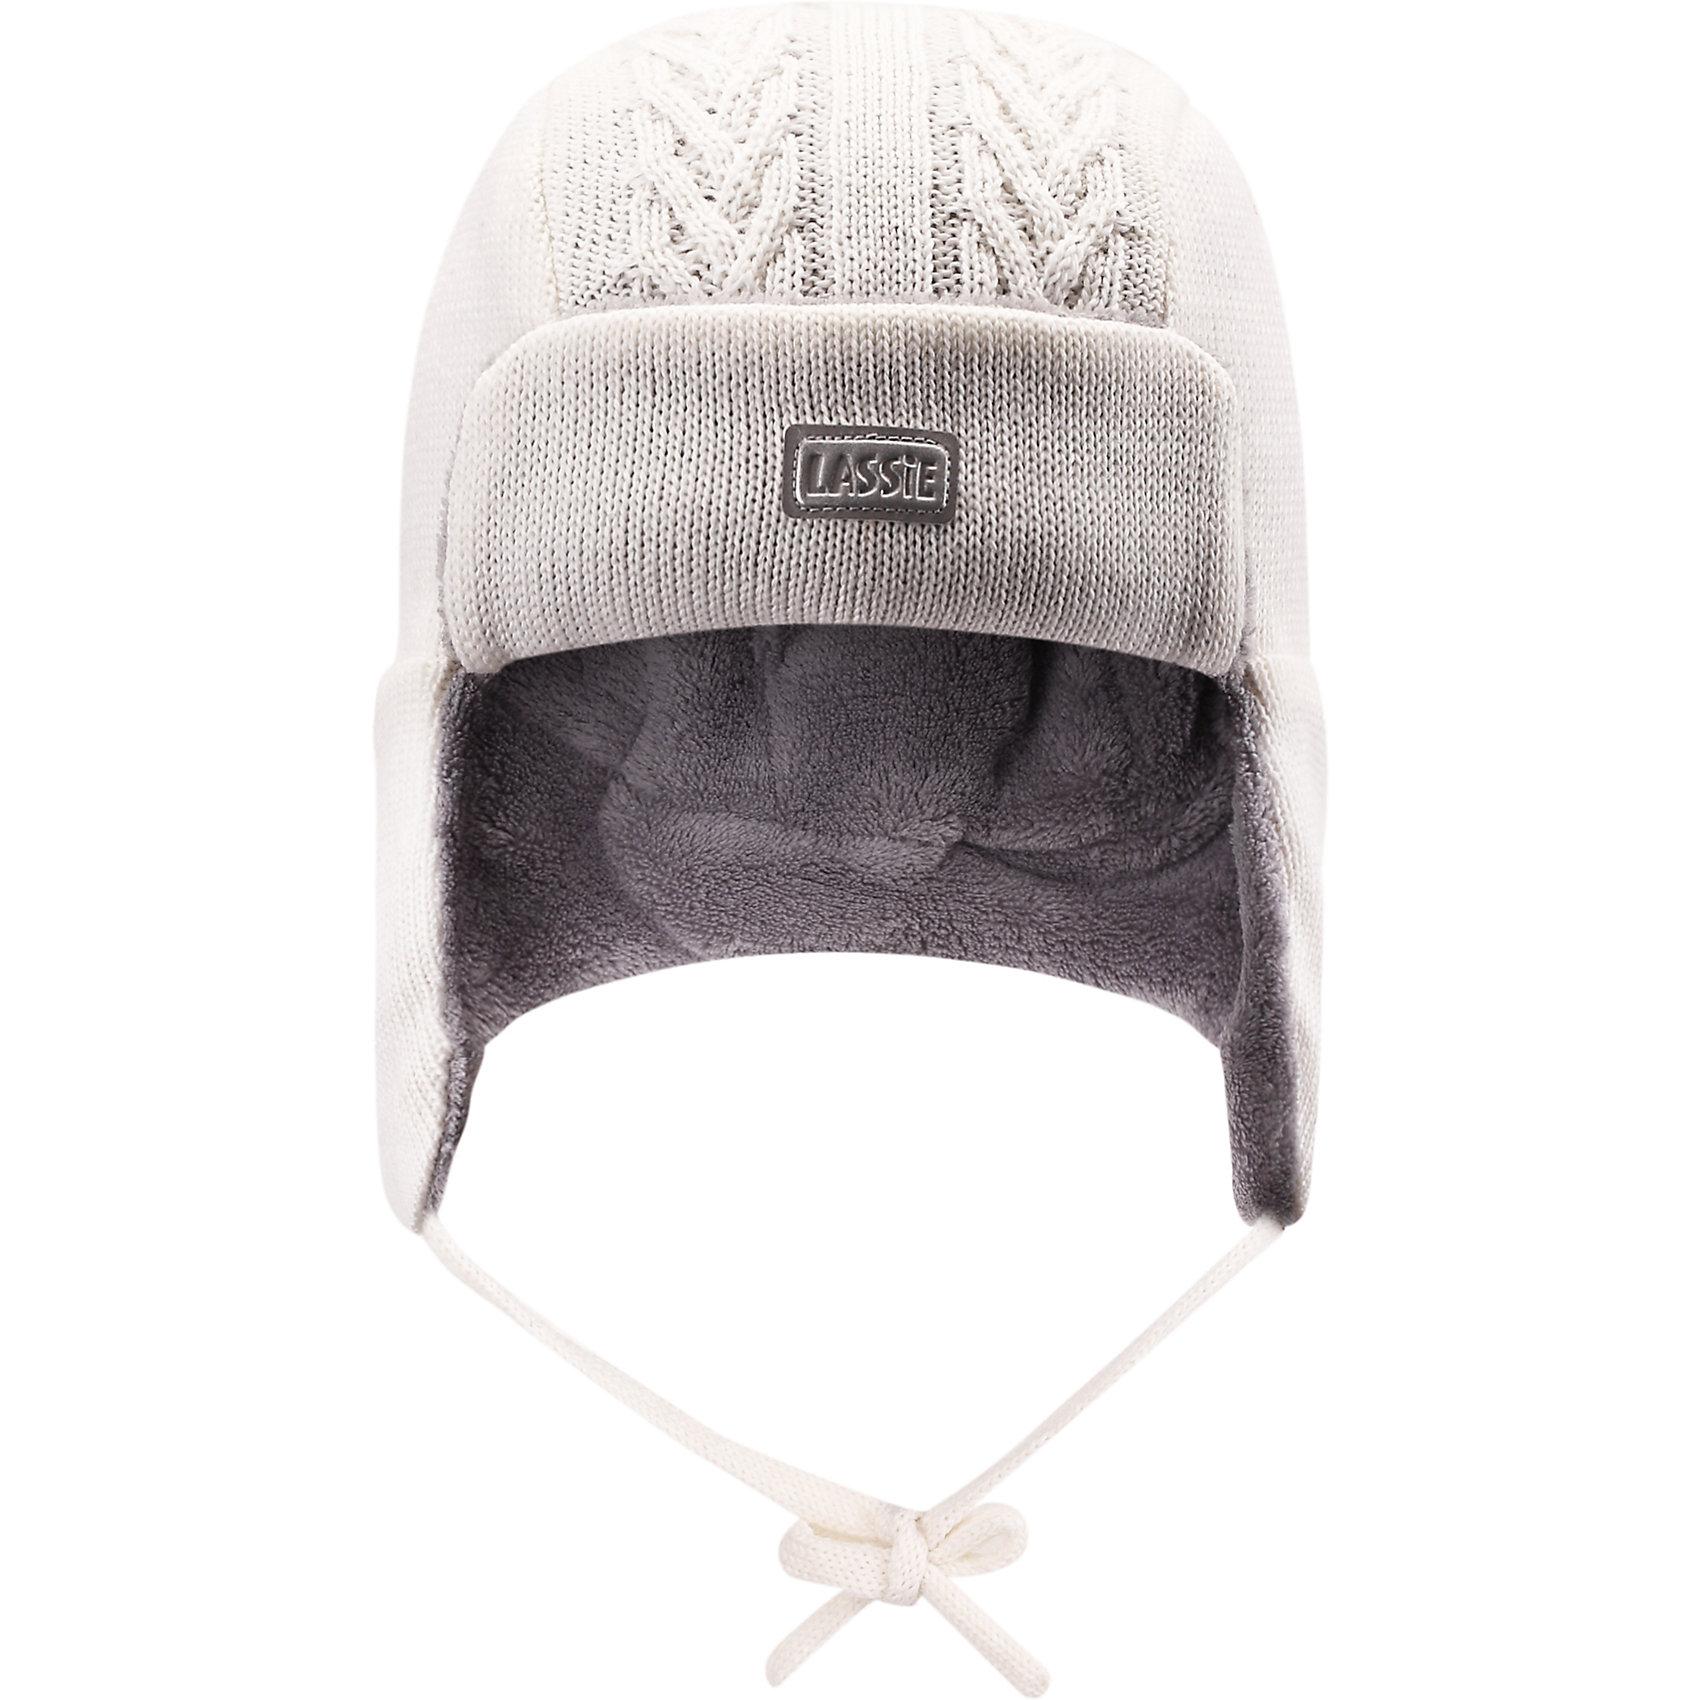 LASSIE by Reima Шапка LASSIE by Reima купить шапка военная зимняя киров